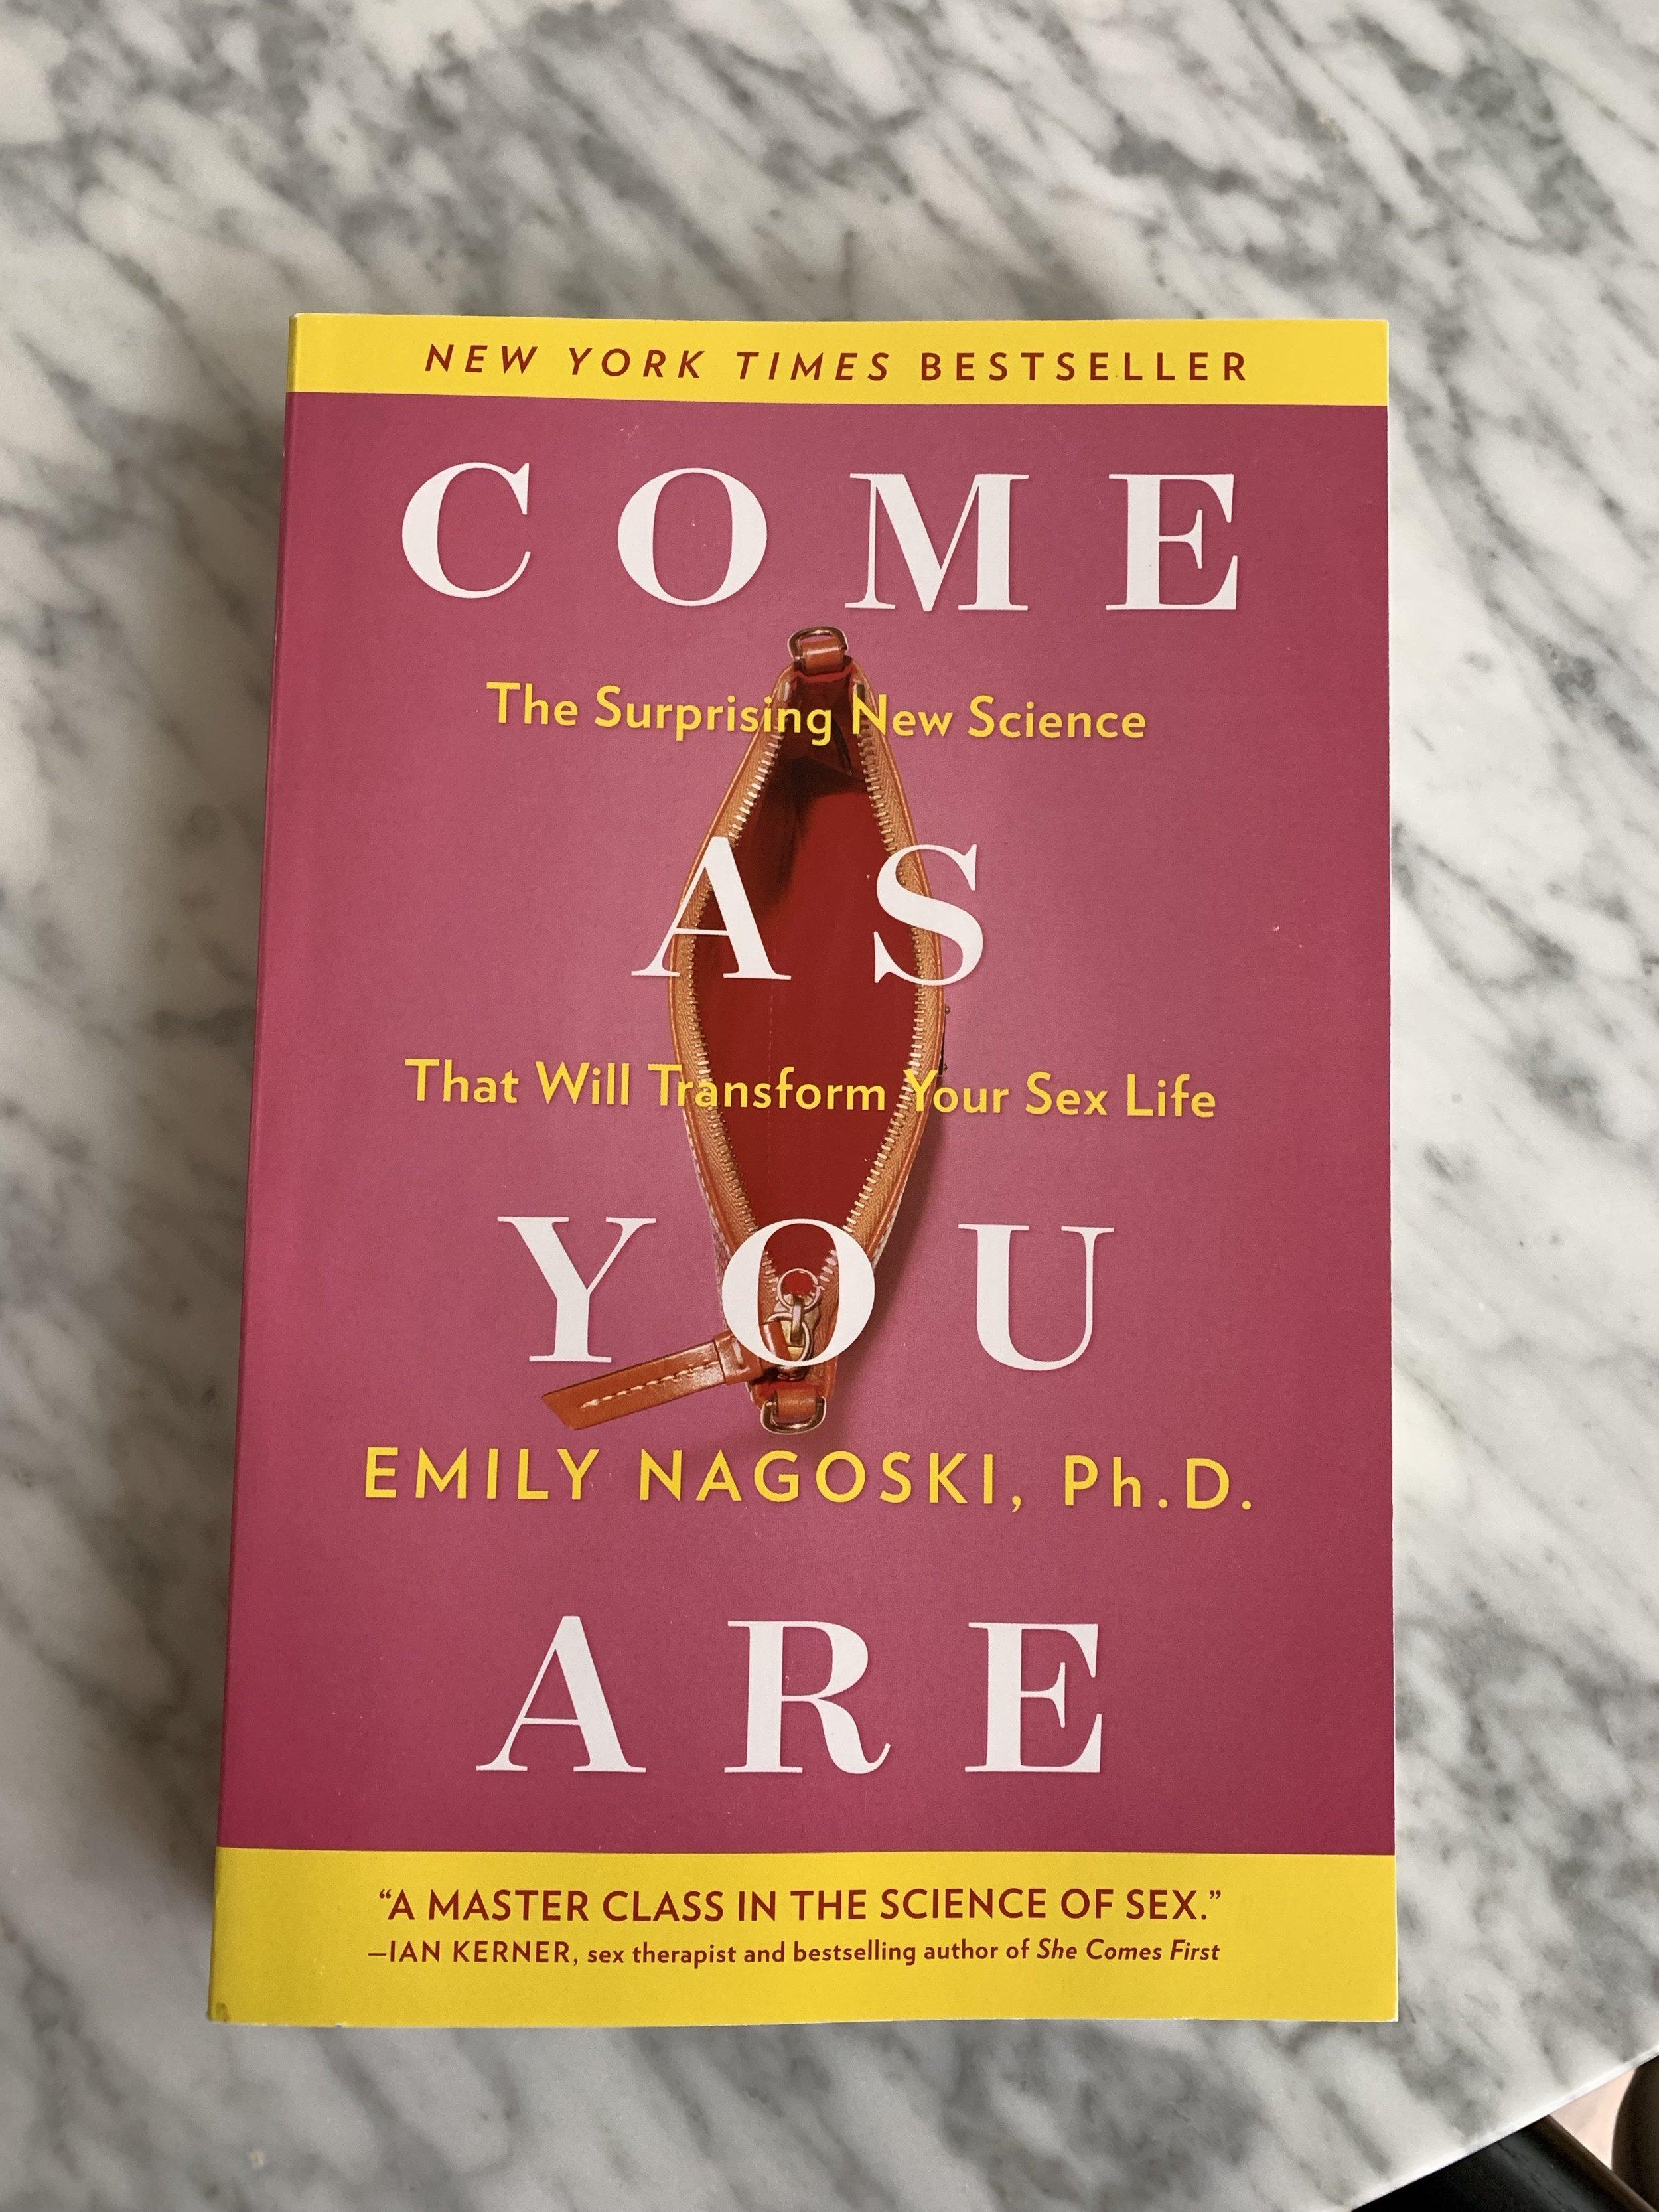 I love you, Emily Nagoski